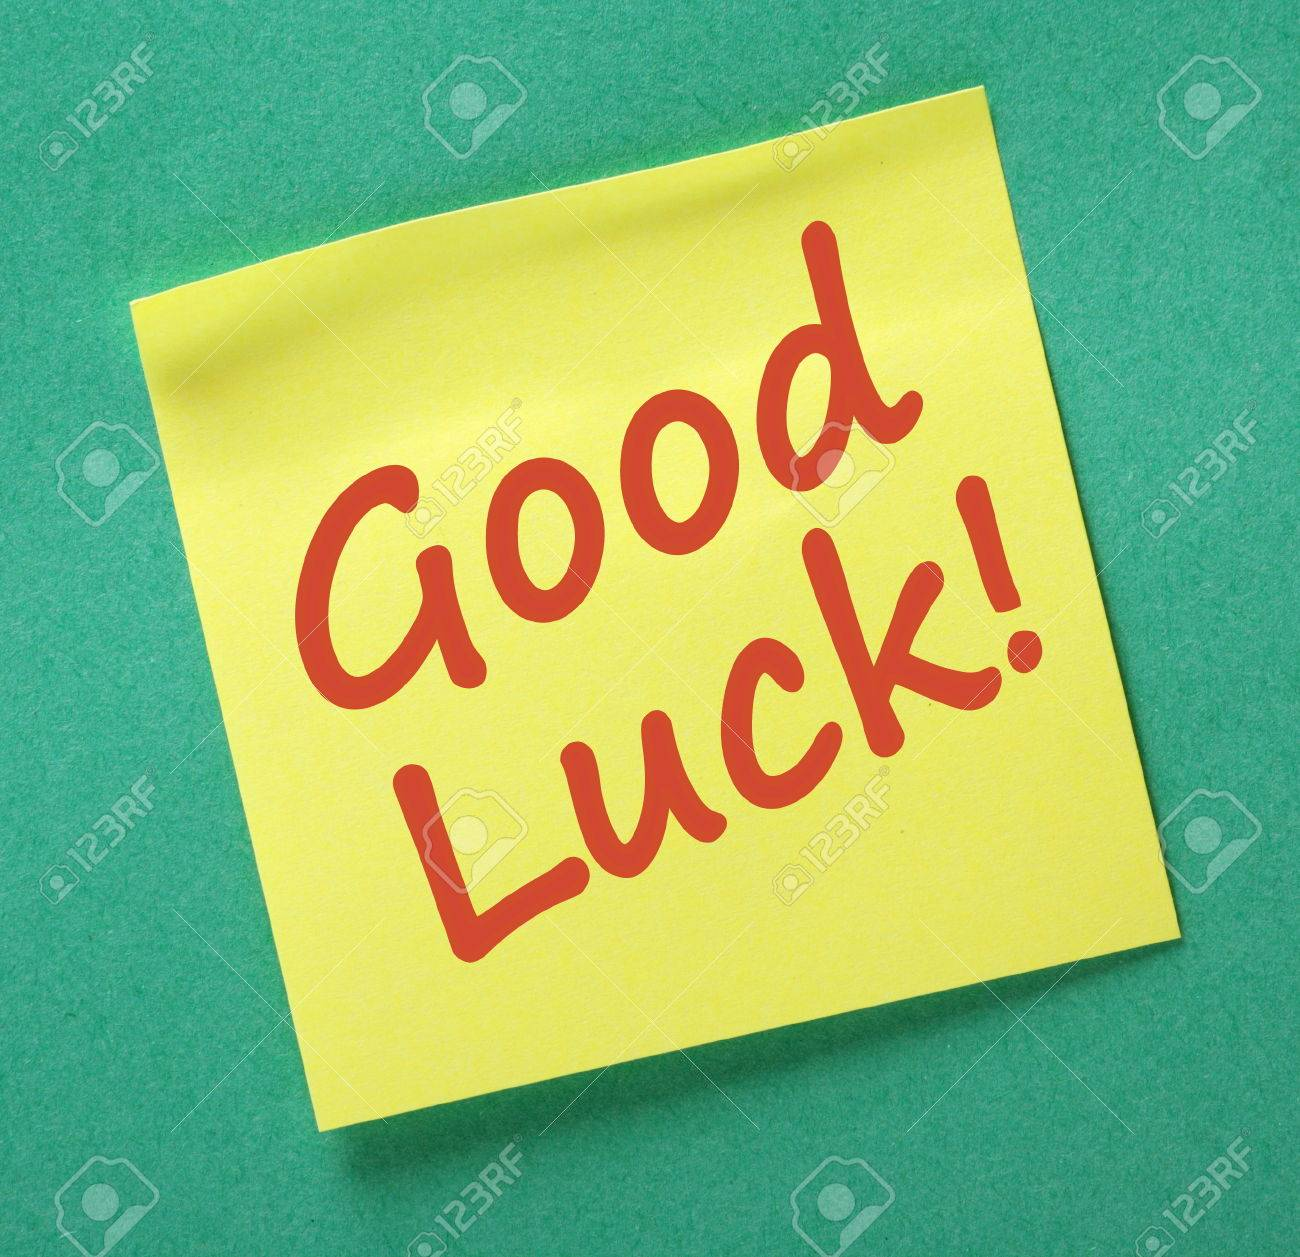 How To Get Good Luck How To Get Good Luck  Peeinn